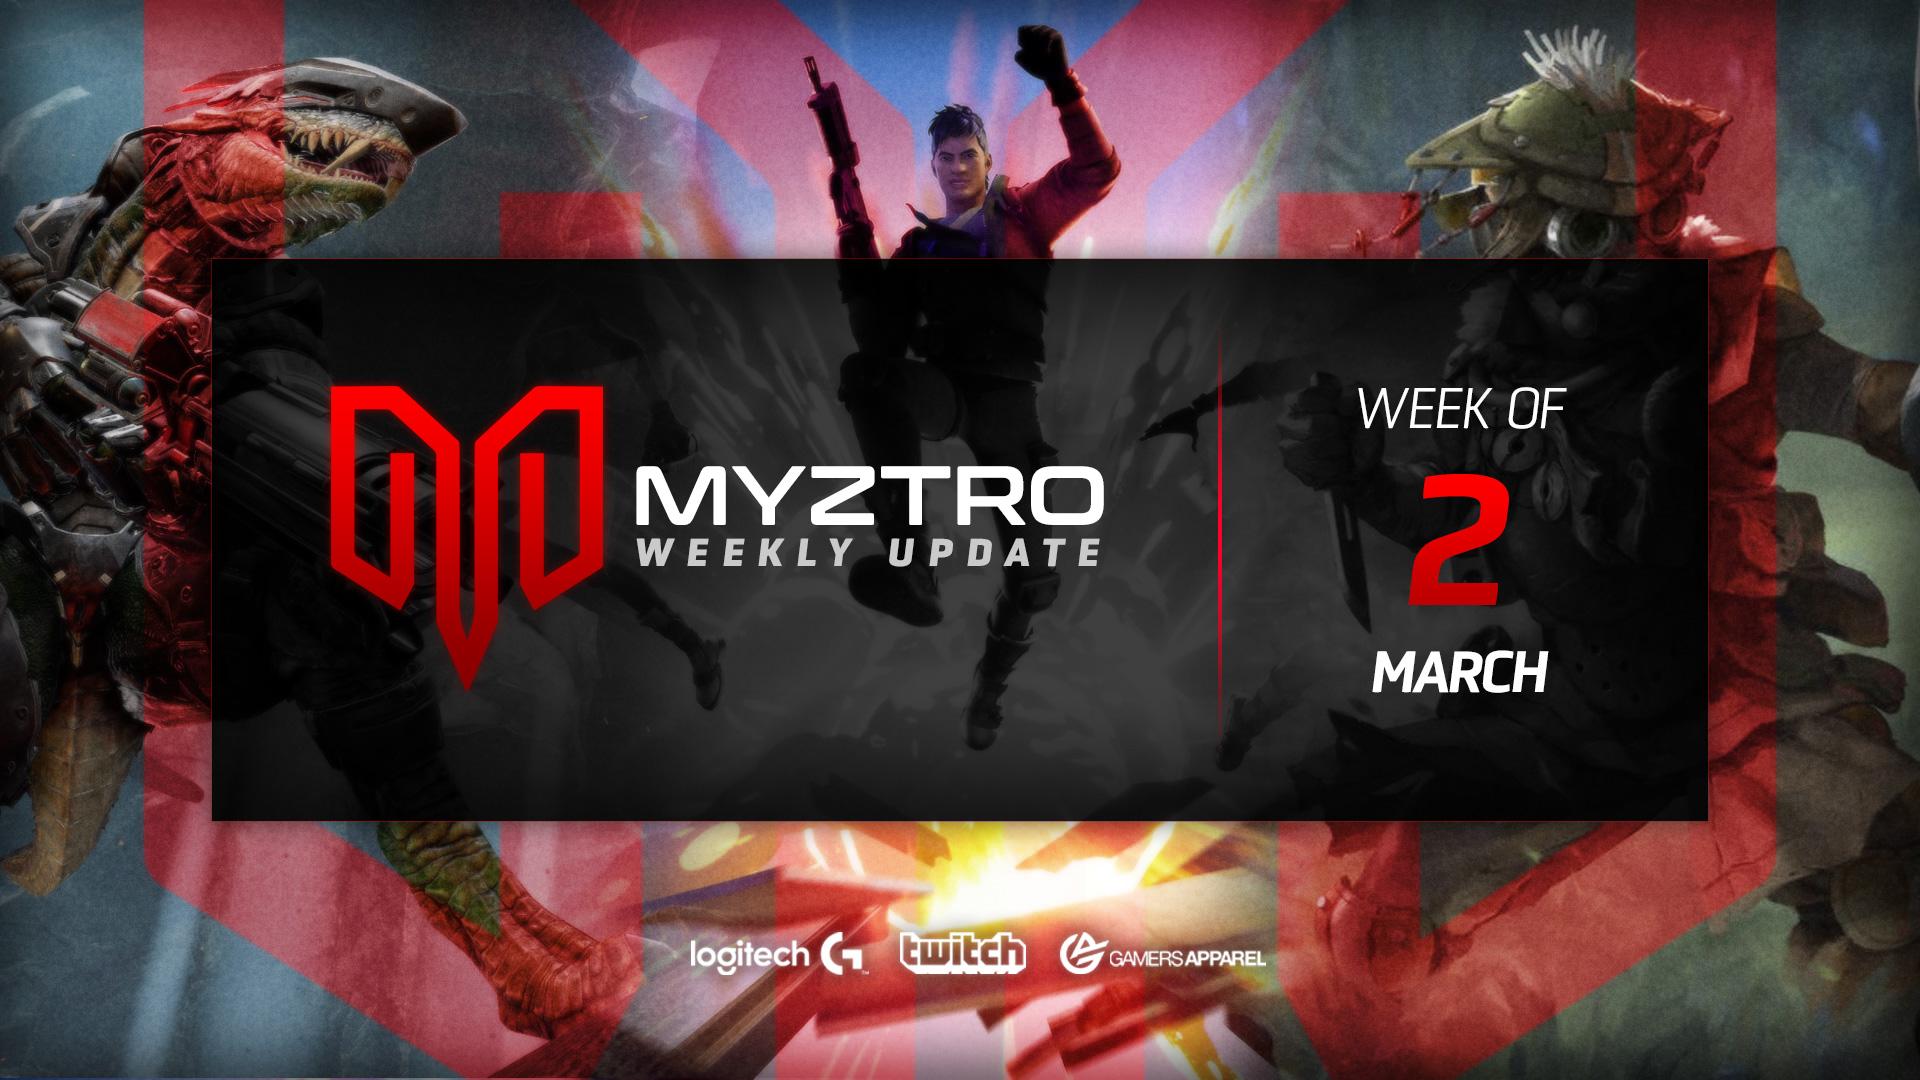 Myztro Weekly Update 13: 3/5/20